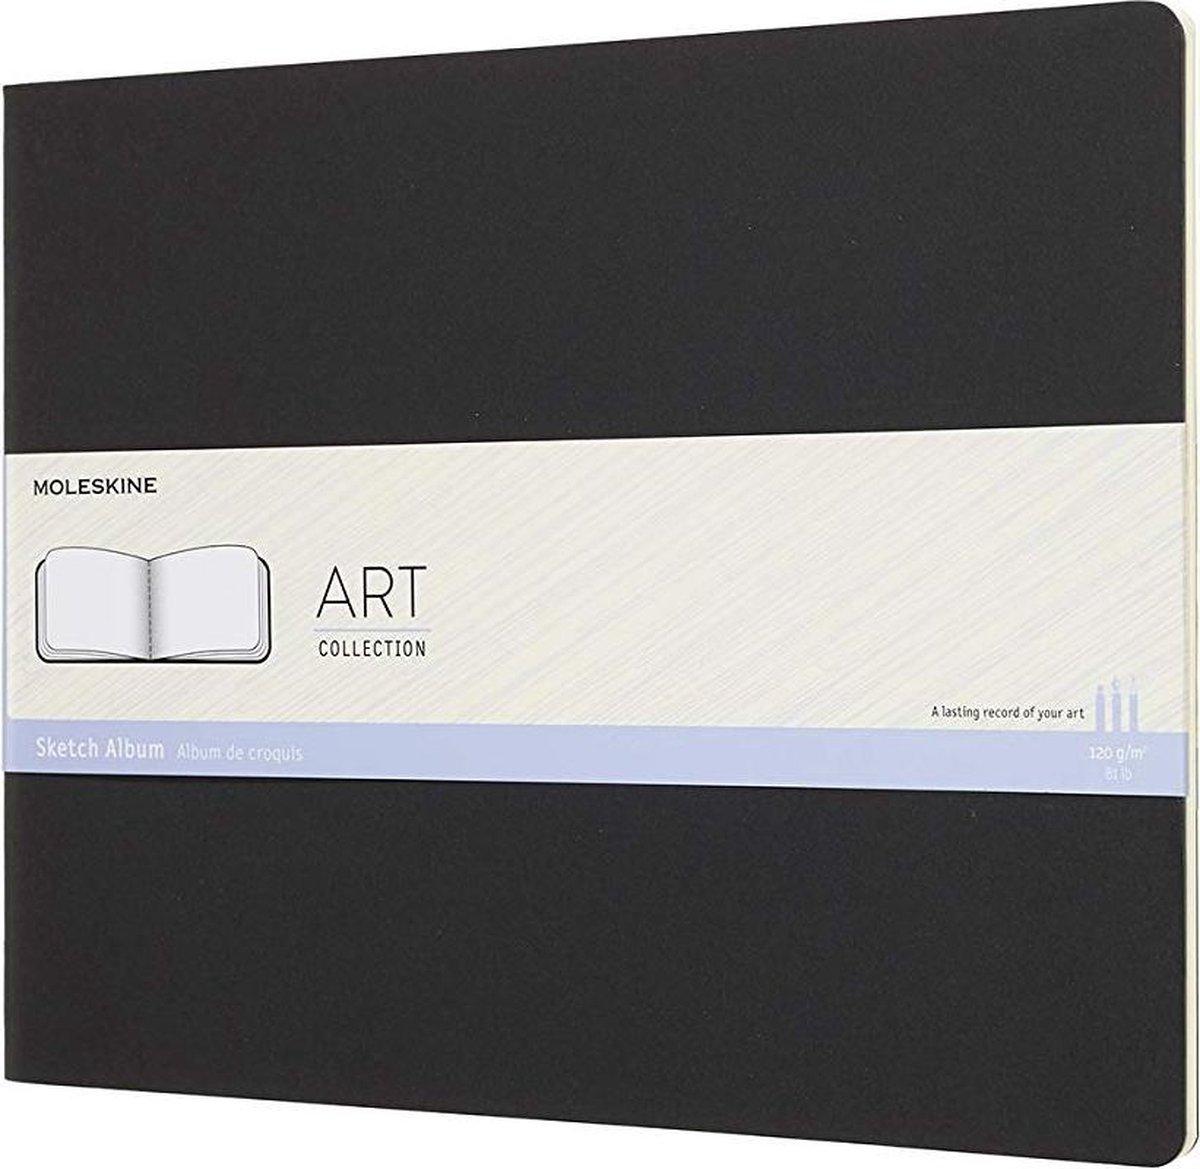 Moleskine Art Schetsboek XXL - Soft cover - Blanco - Zwart